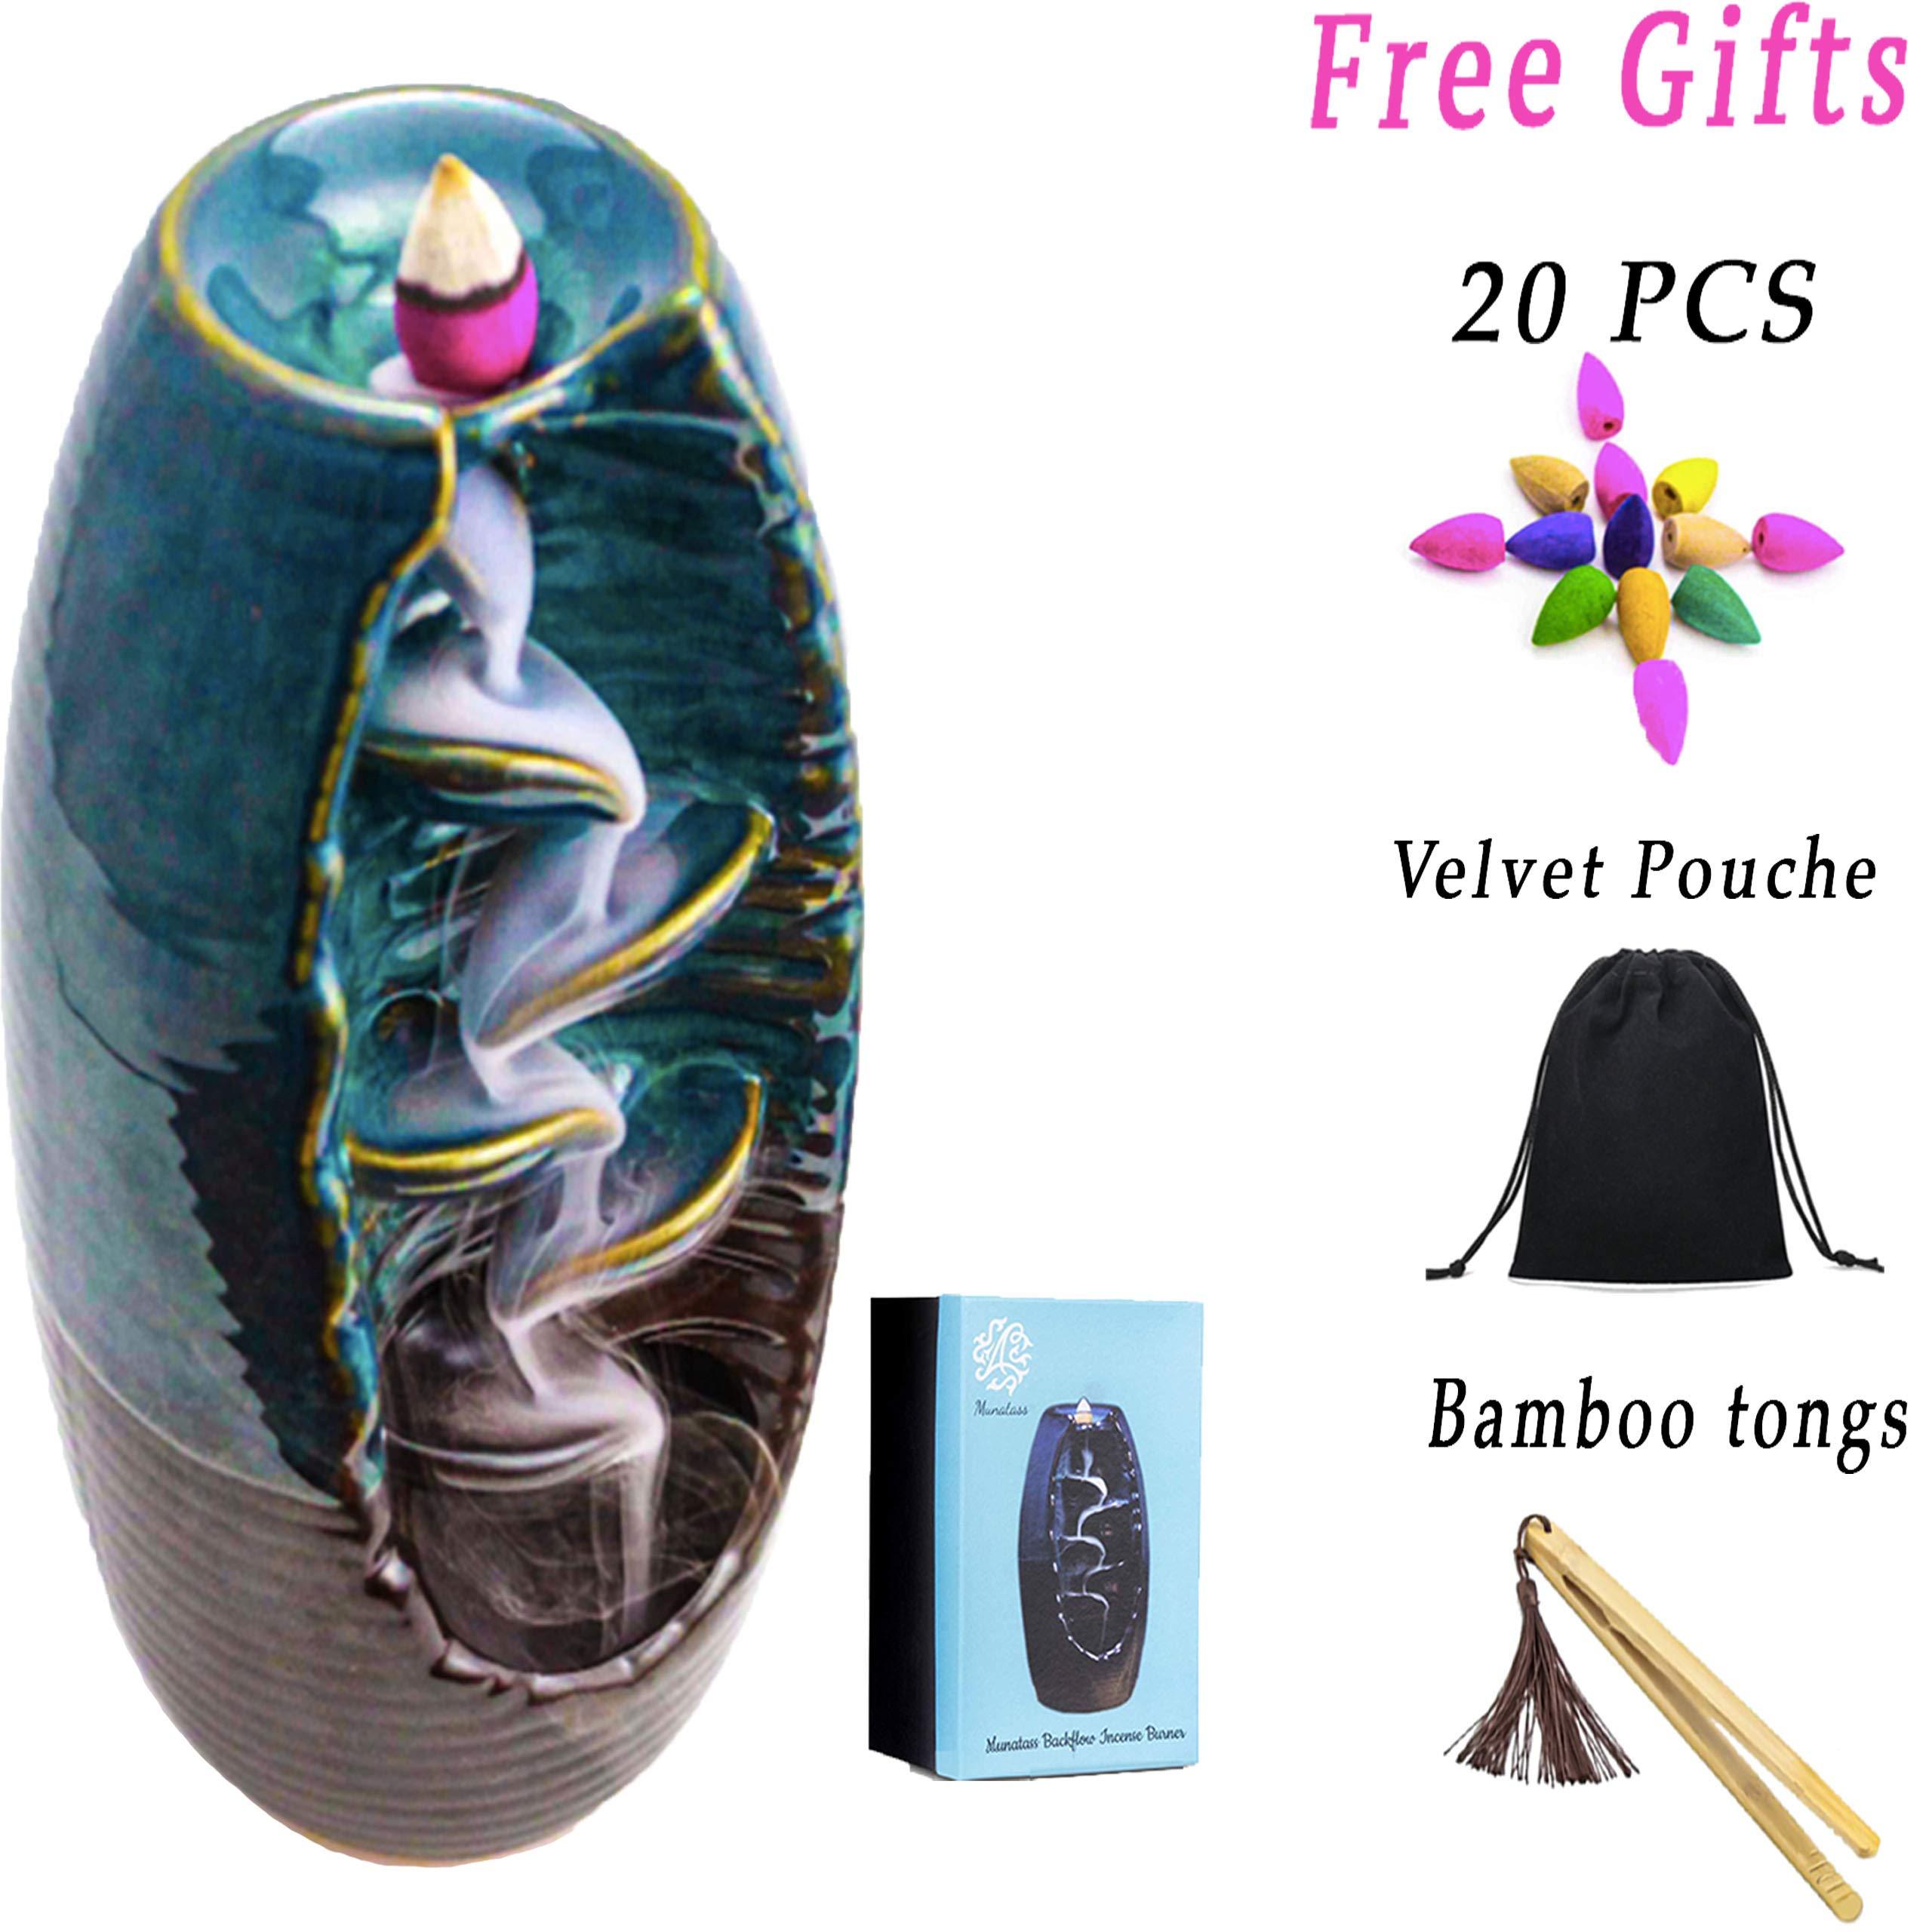 Munatass Ceramic Backflow Incense Holder - Handmade Waterfall Incense Burner Ornament Perfect for Aromatherapy, Home, Decor, Yoga, Spa & Meditation - with 20 Free Incense Burner Cones by Munatass